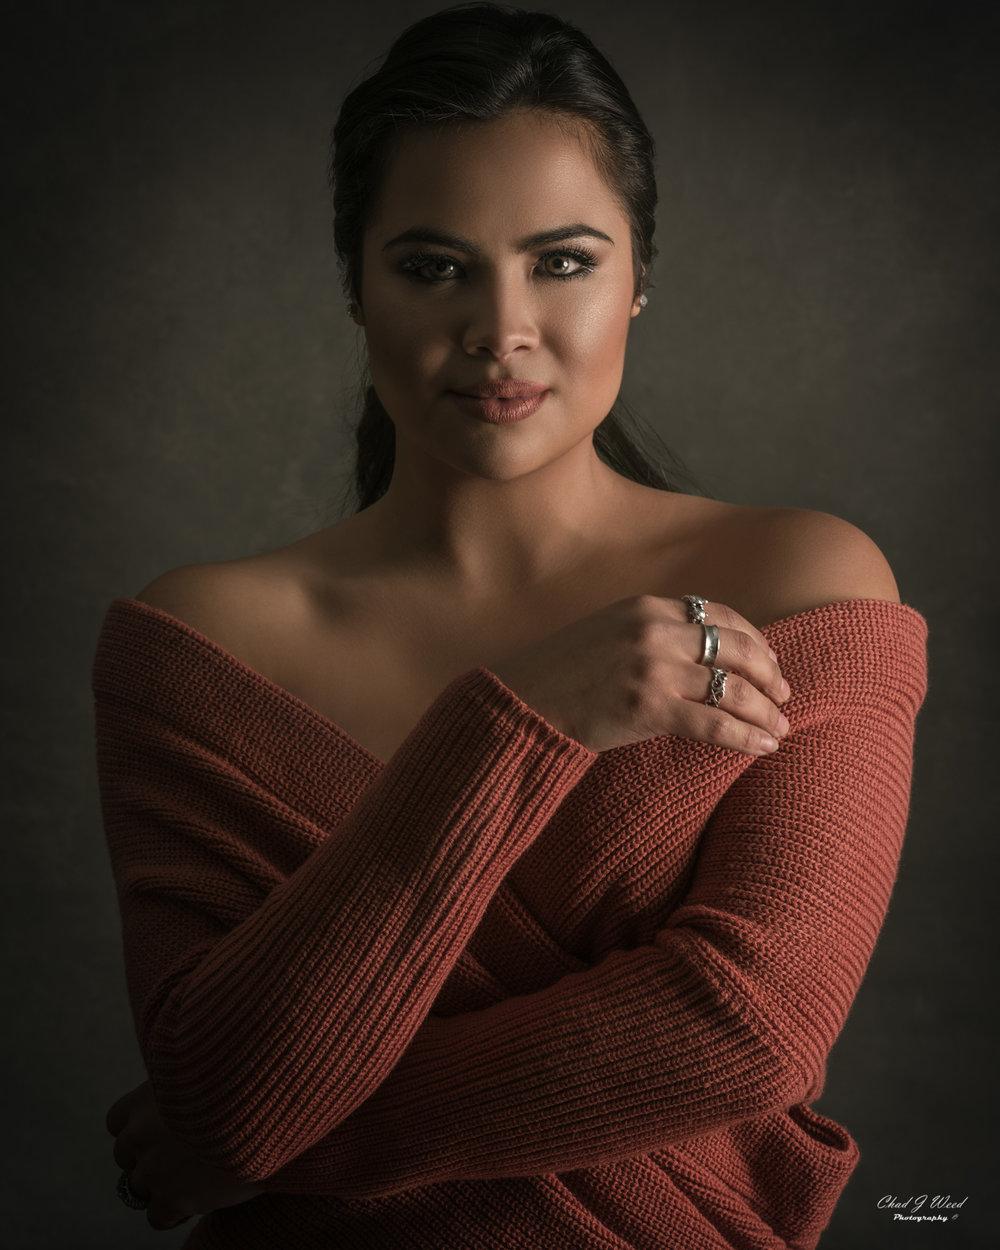 Mesa Arizona Headshot Photographer Chad Weed of Beauty Model Karla